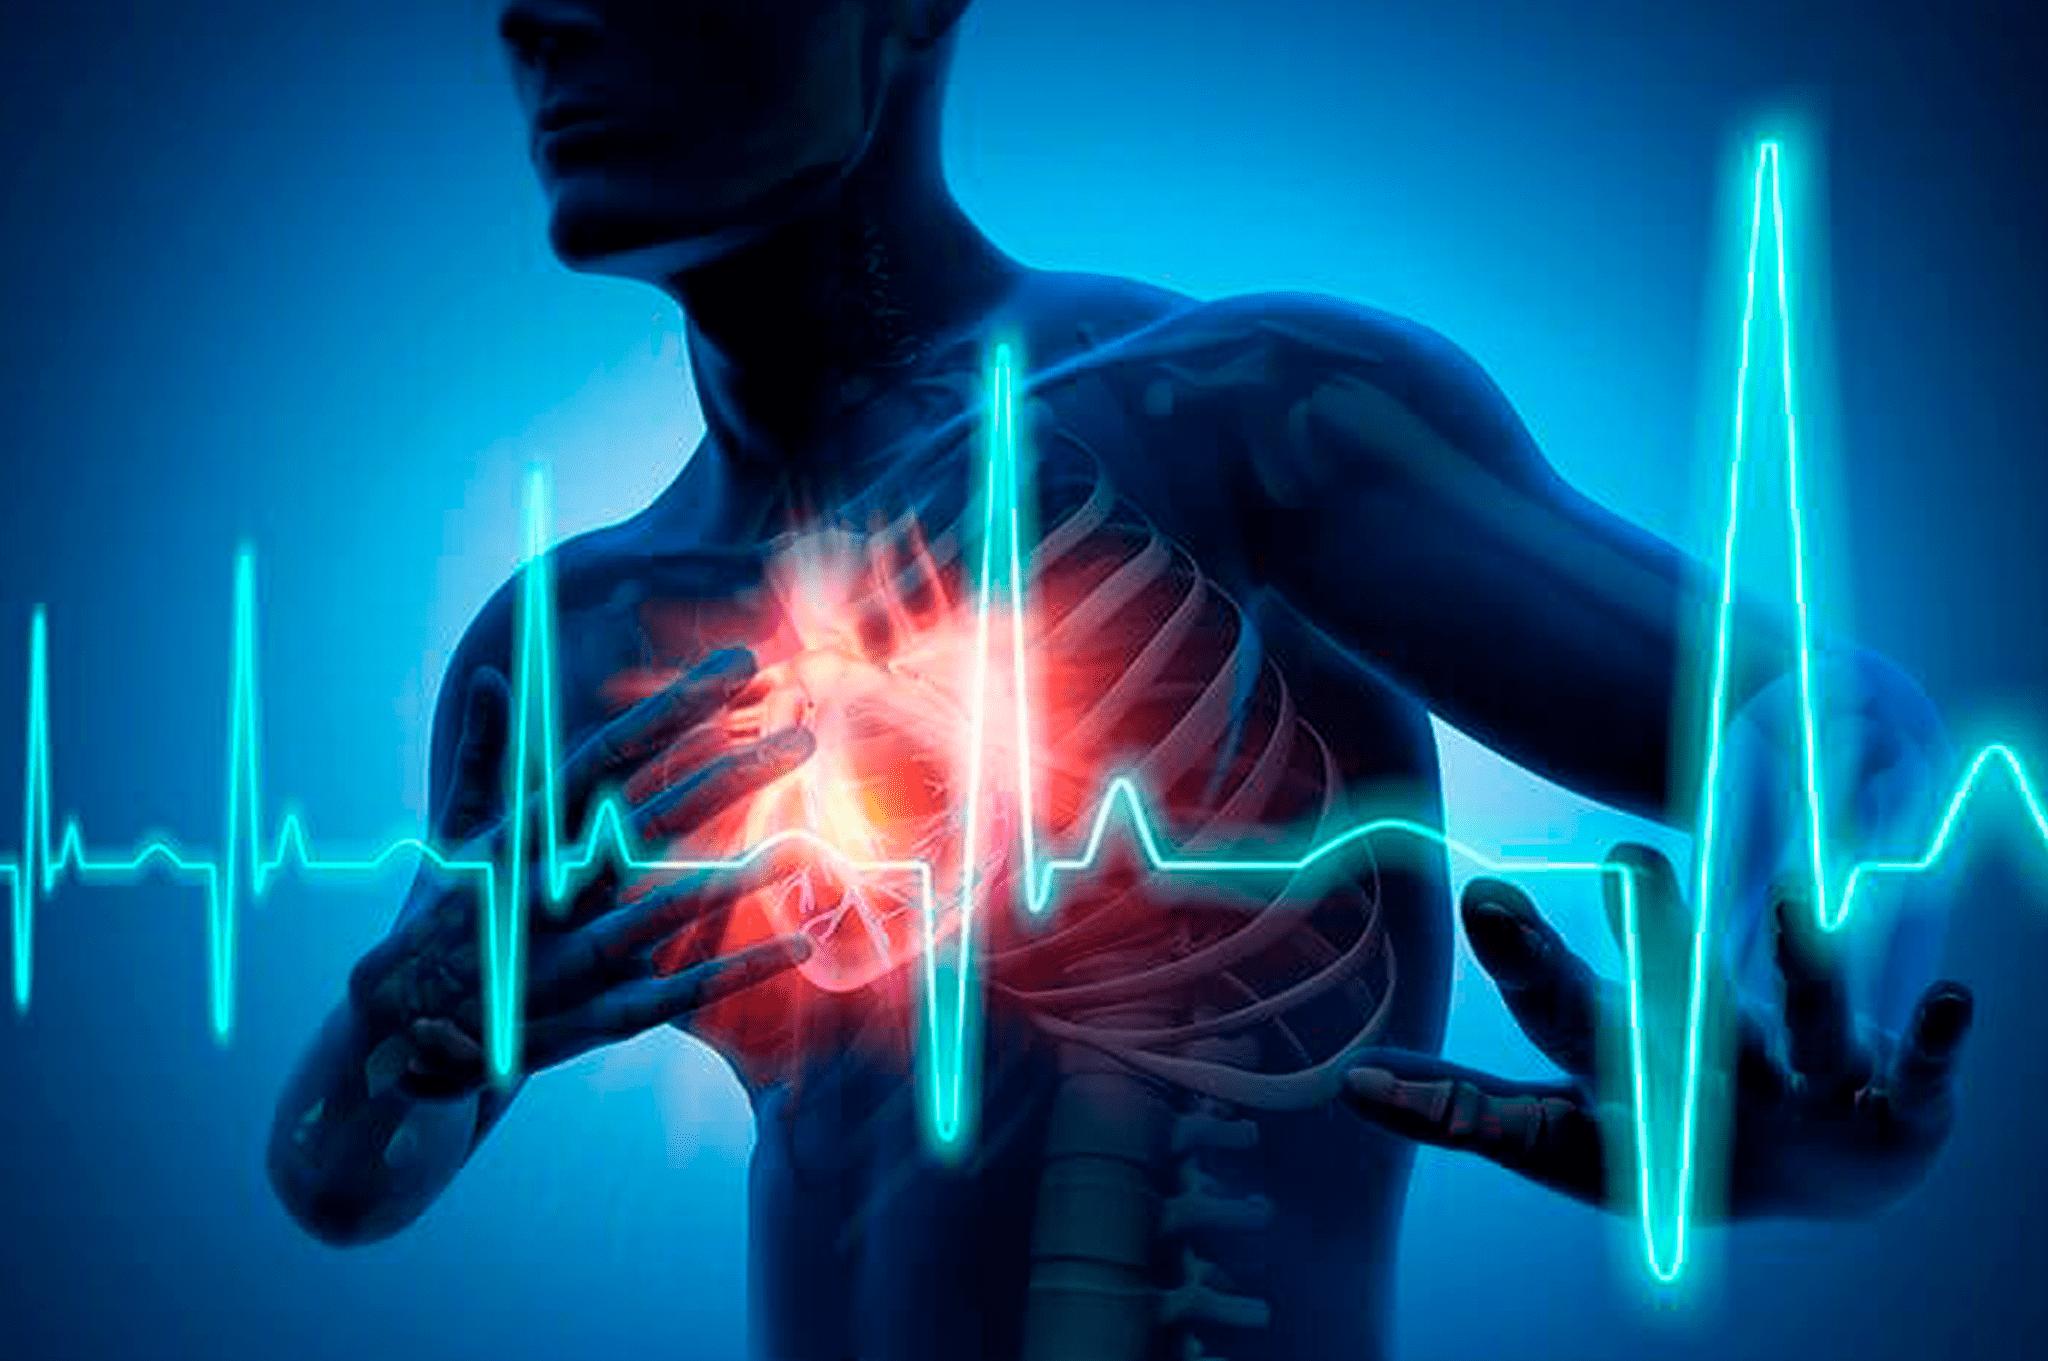 meddi - insuficiencia cardiaca-min